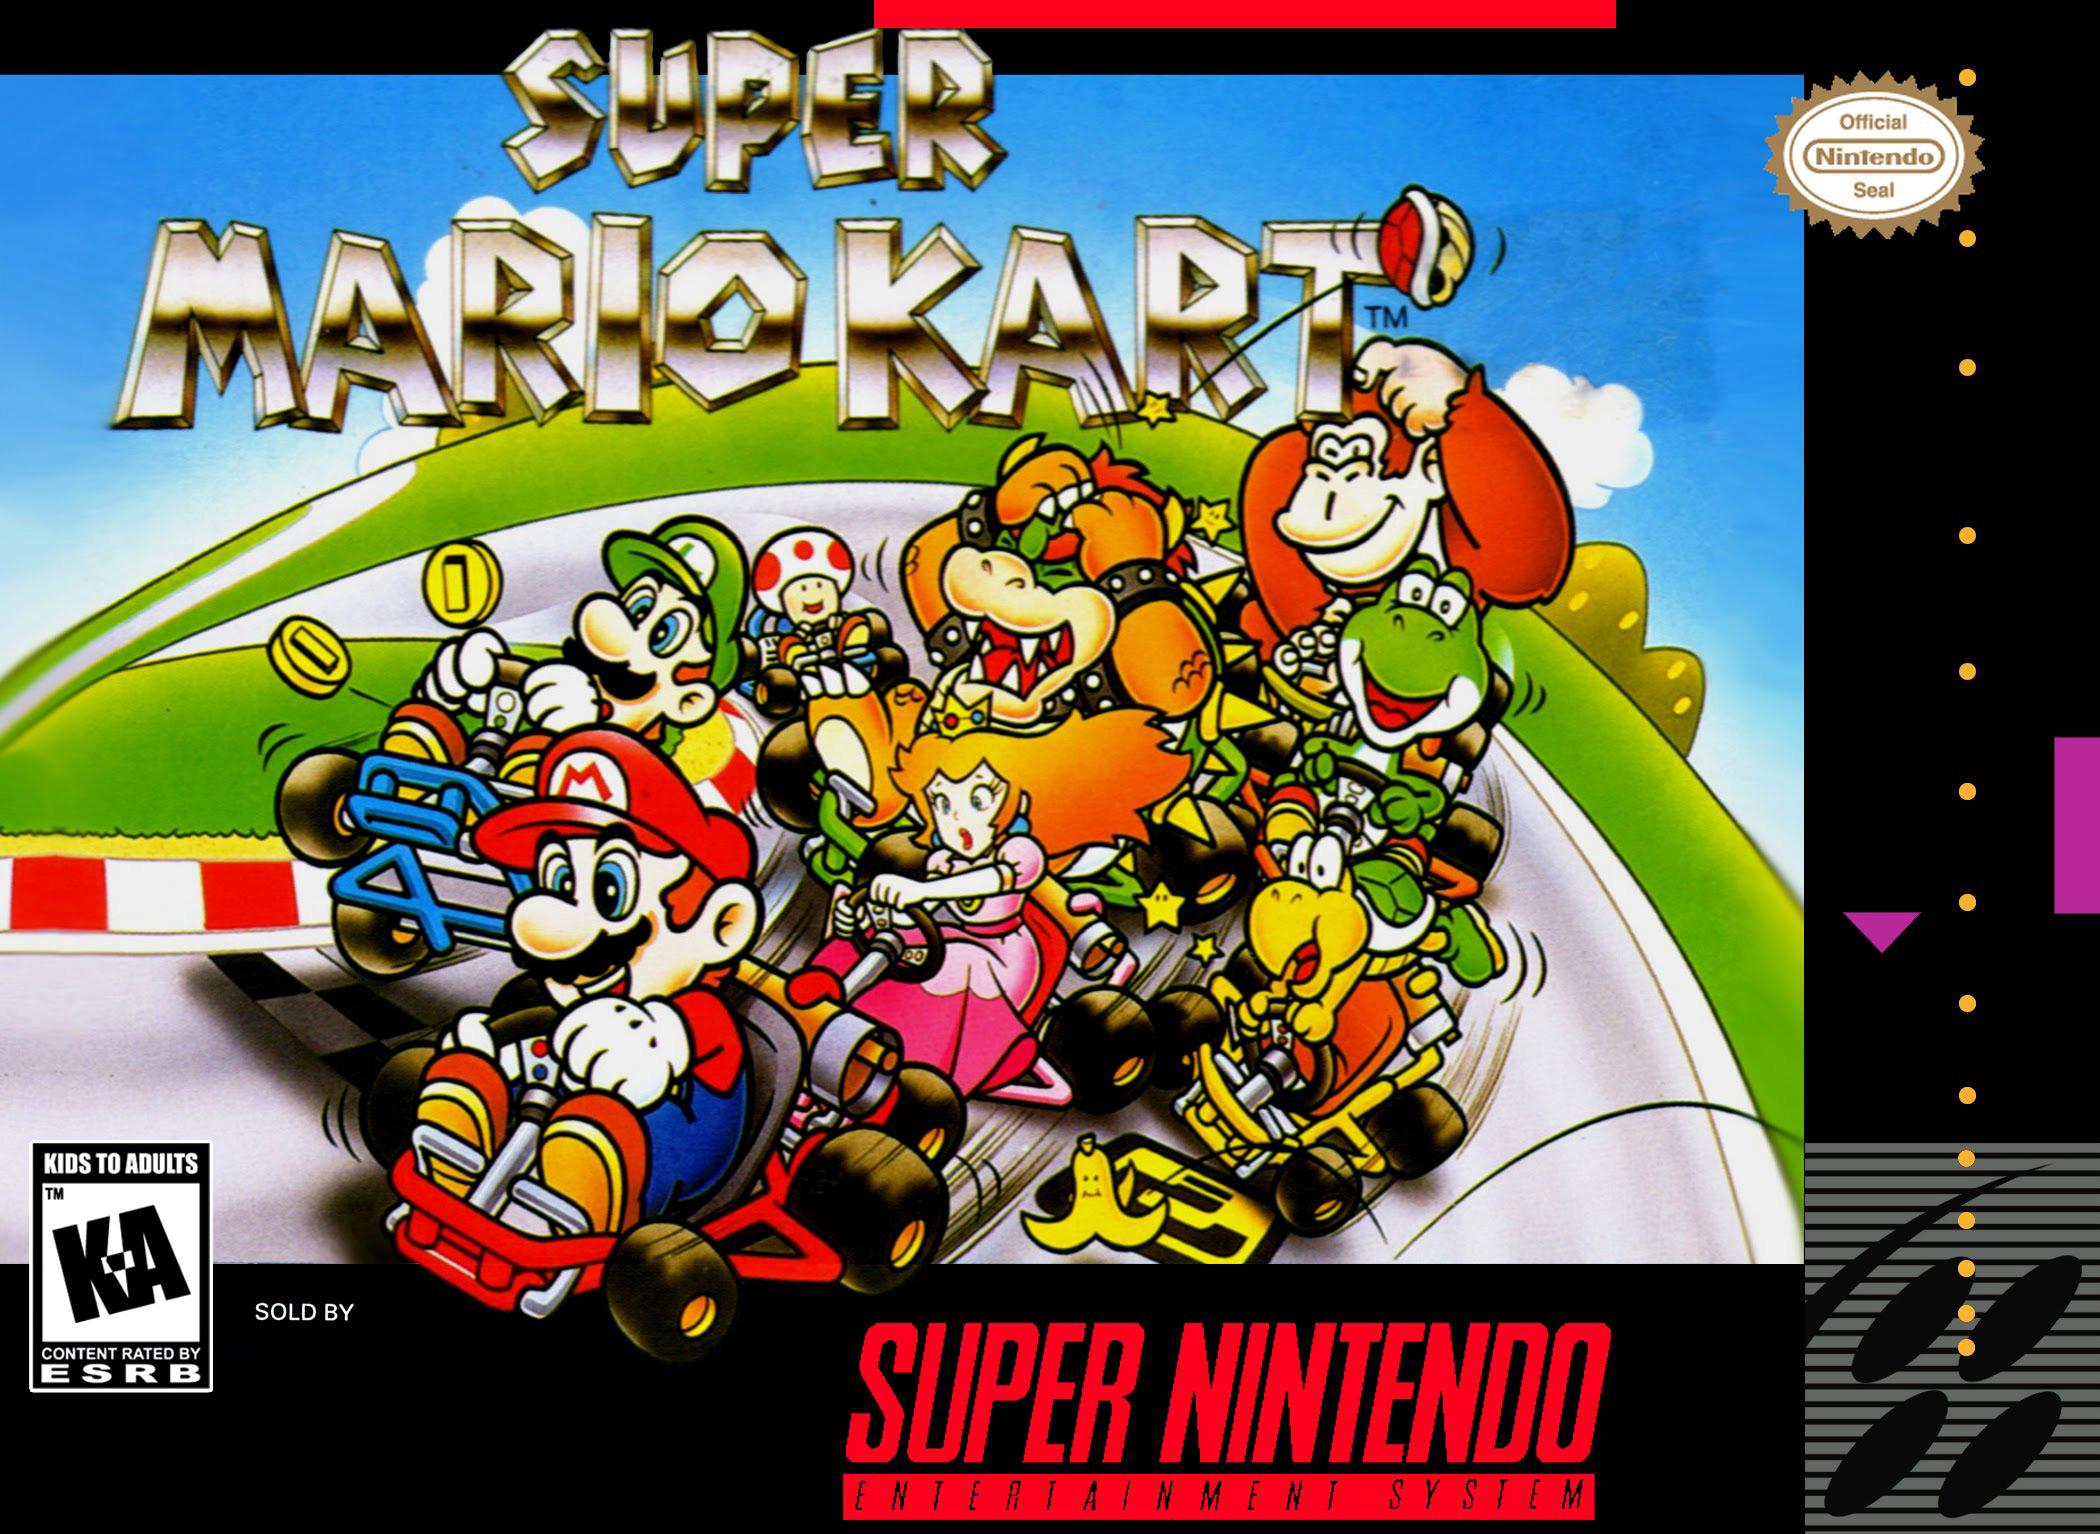 For its 25th anniversary, tell us your favorite Mario Kart memory screenshot